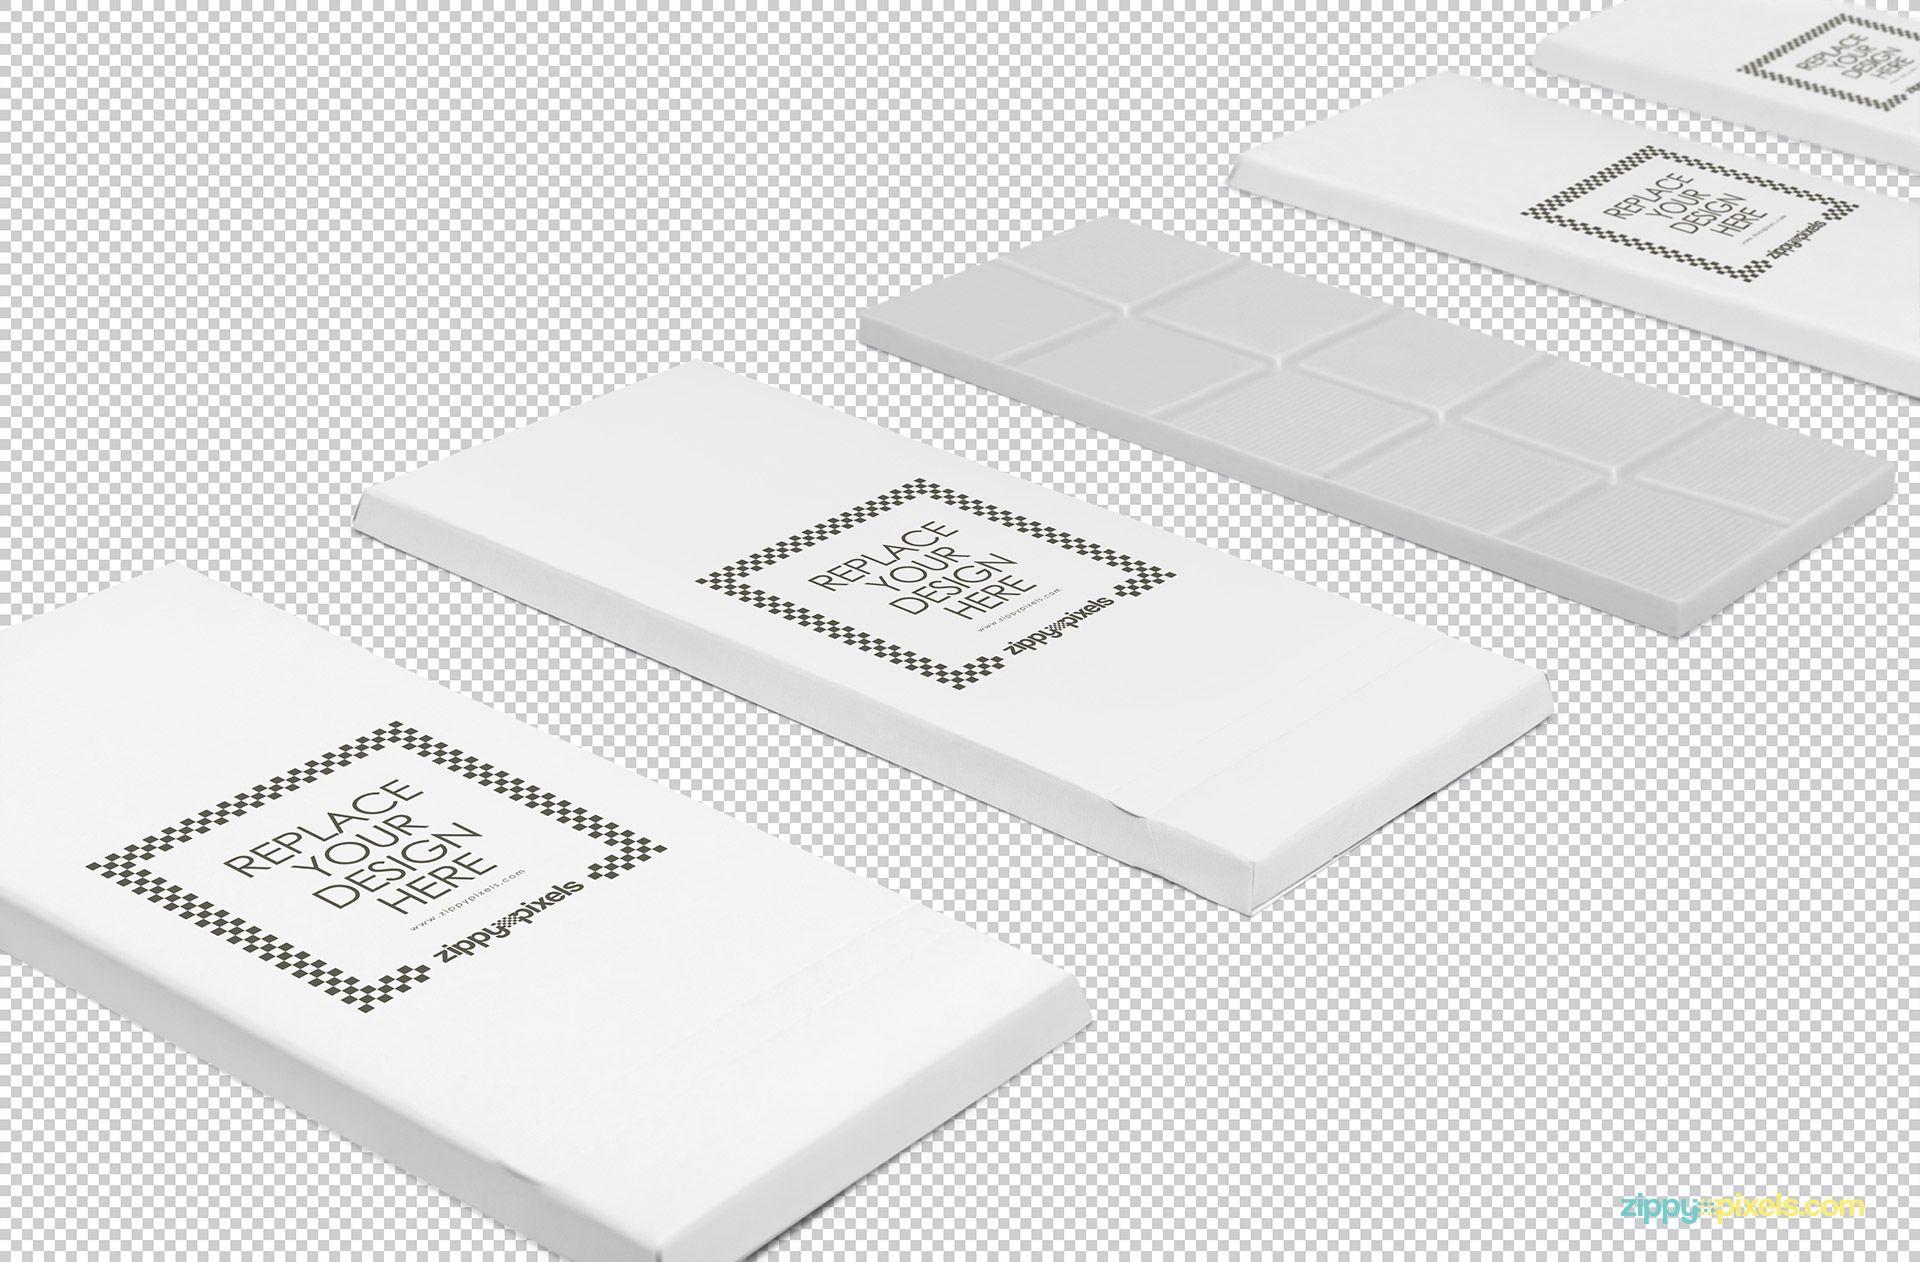 Download Free Cool Chocolate Bar Mockup Zippypixels Psd Templates Packaging Mockup Poster Mockup Psd